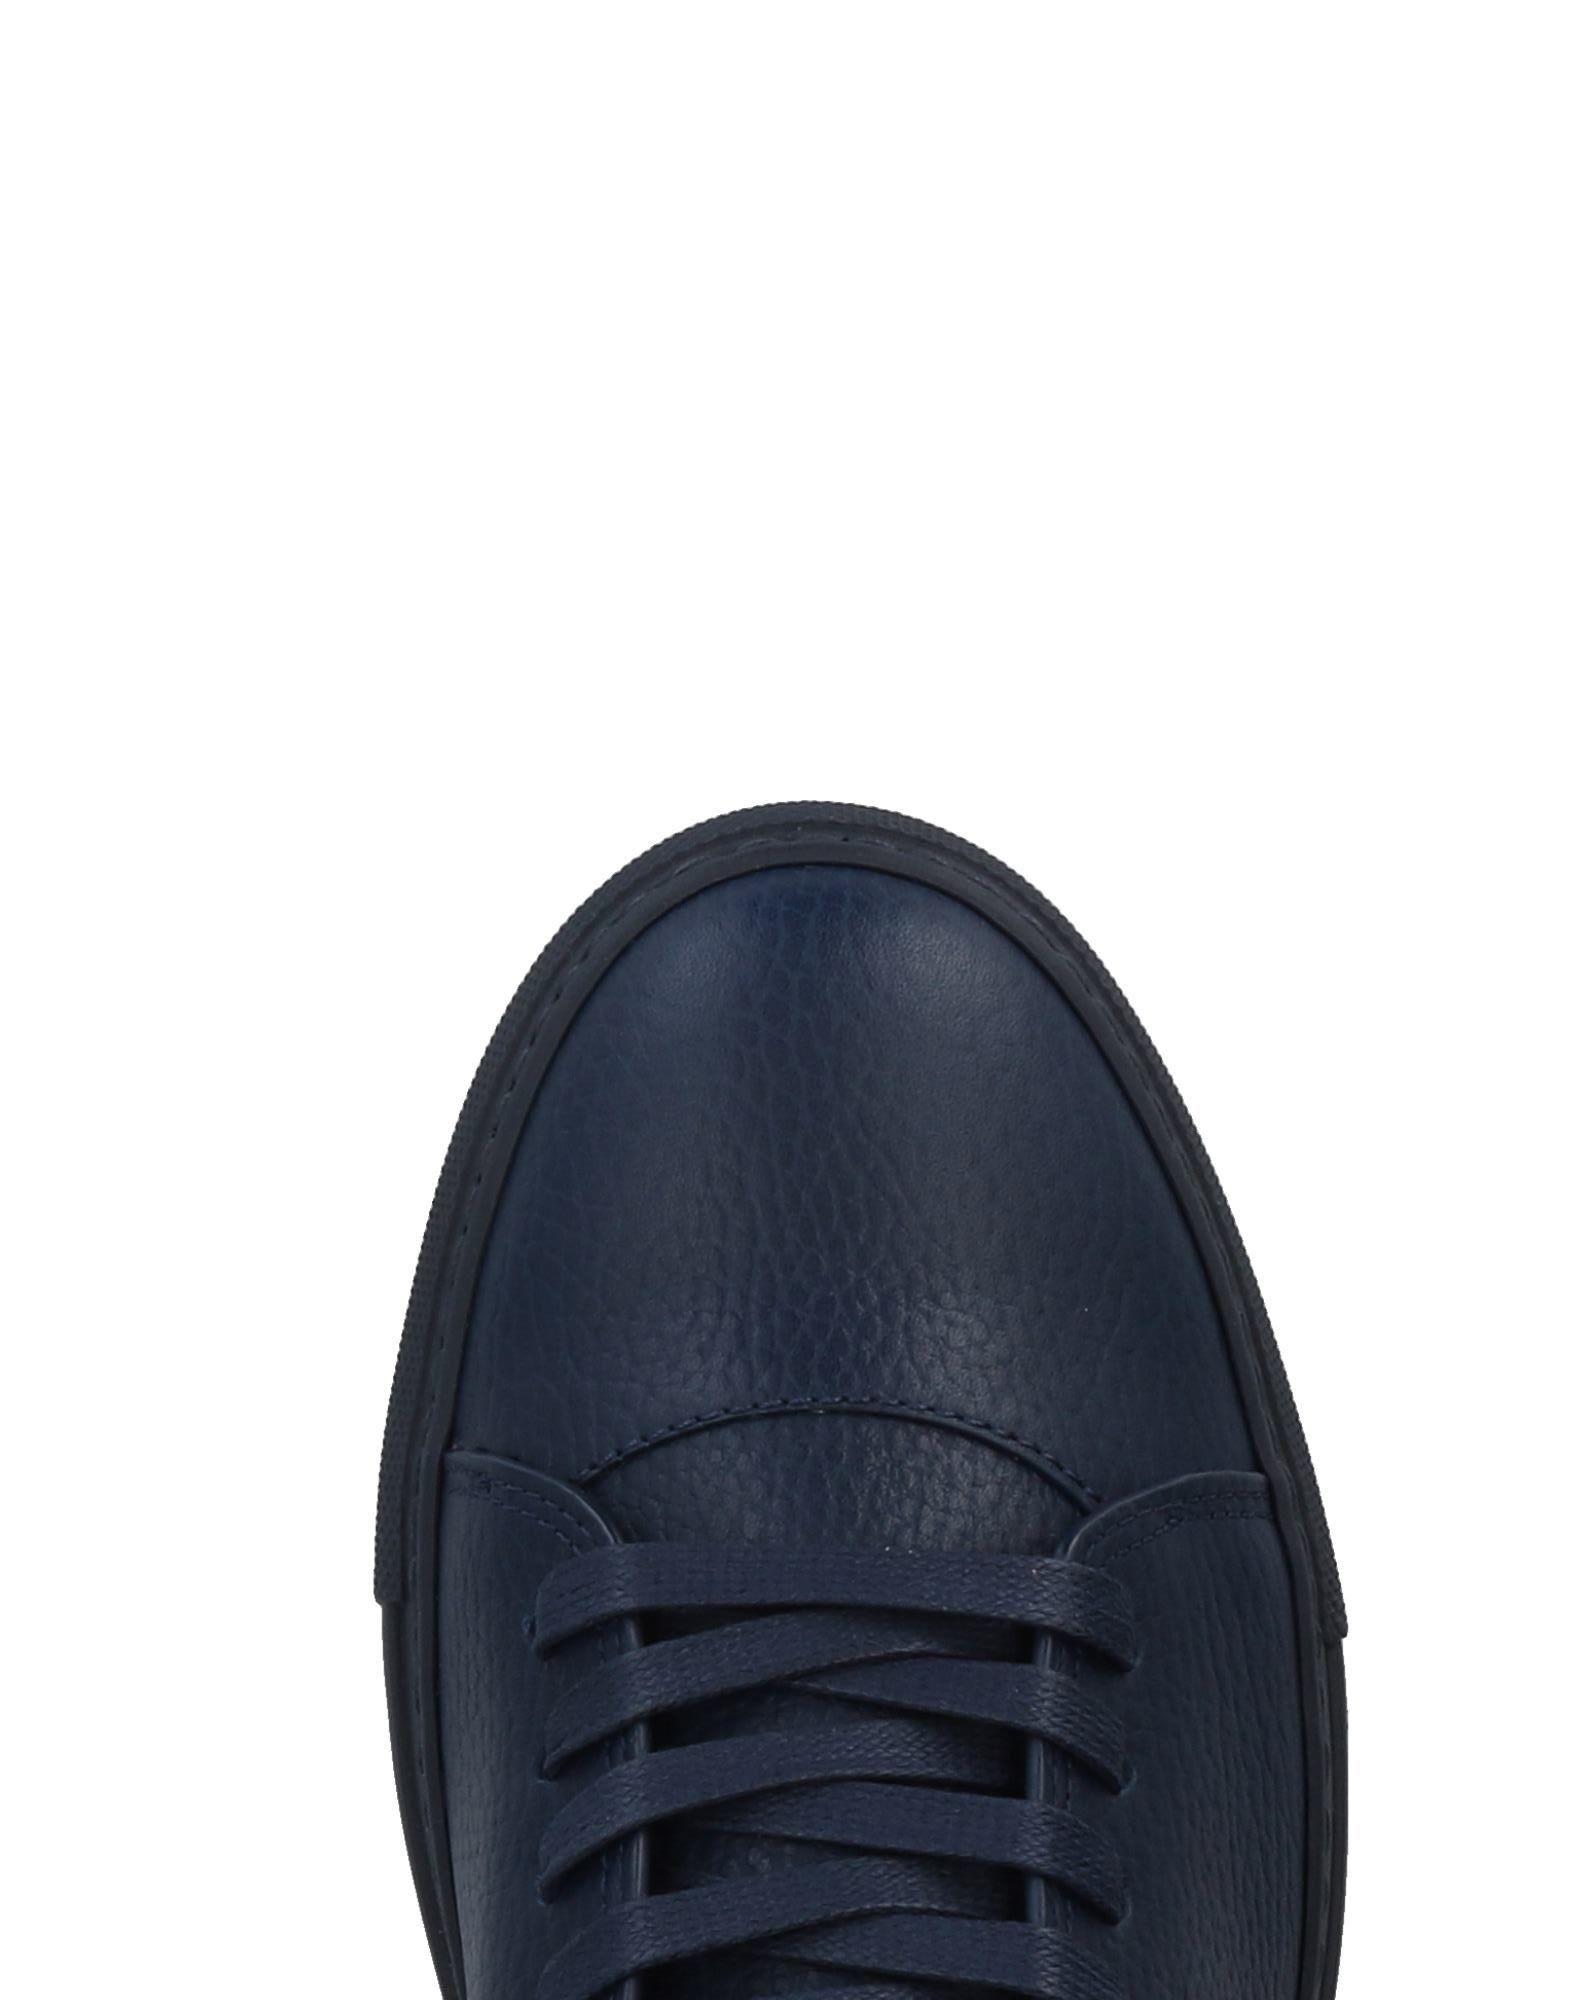 Sneakers Buscemi Homme - Sneakers Buscemi sur